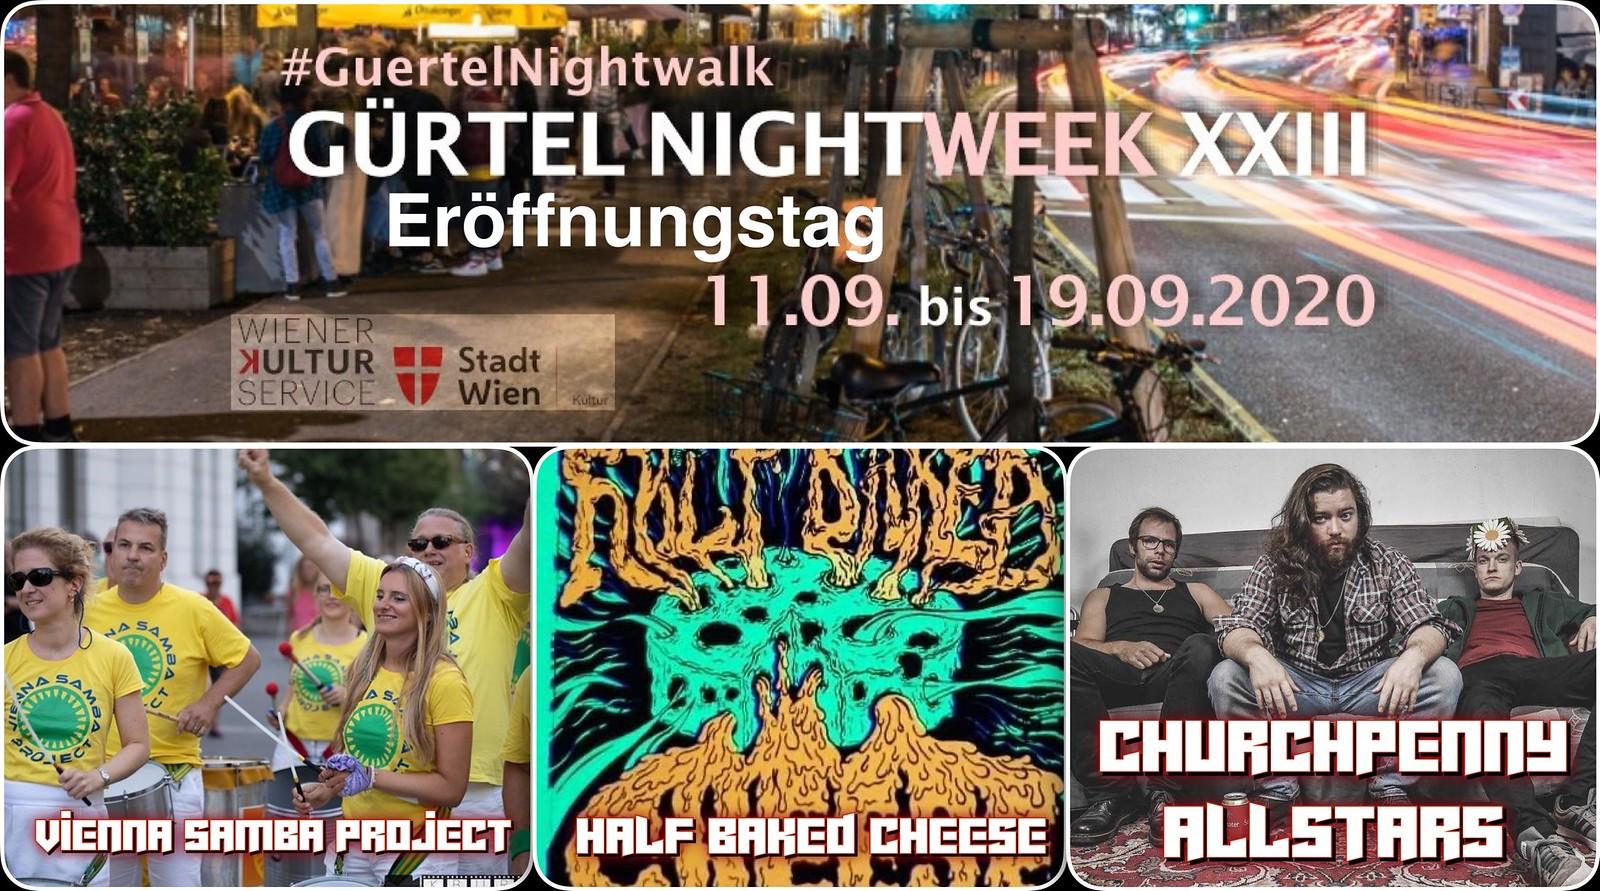 Gürtel Nightwalk XXIII